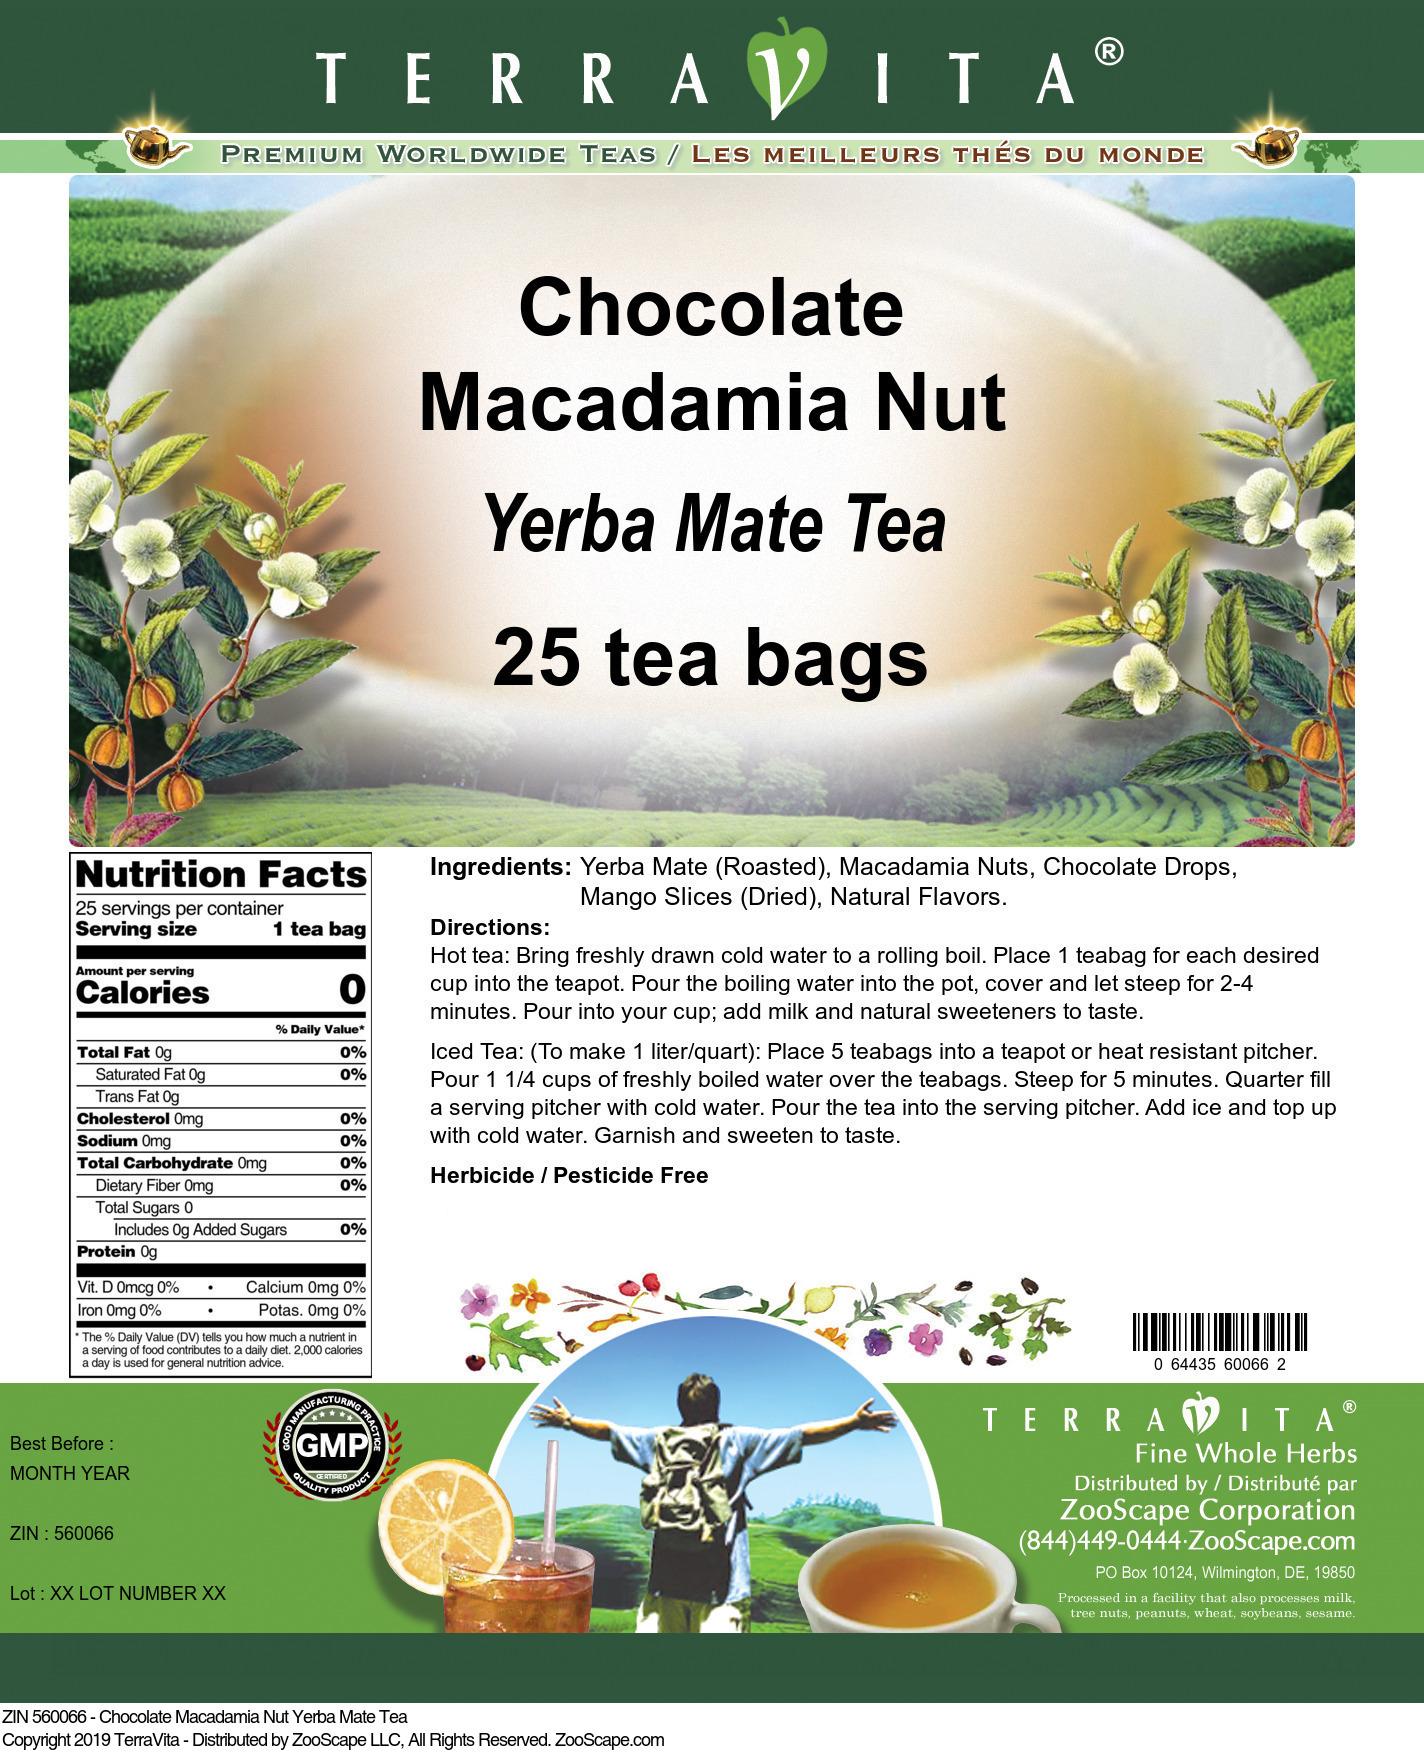 Chocolate Macadamia Nut Yerba Mate